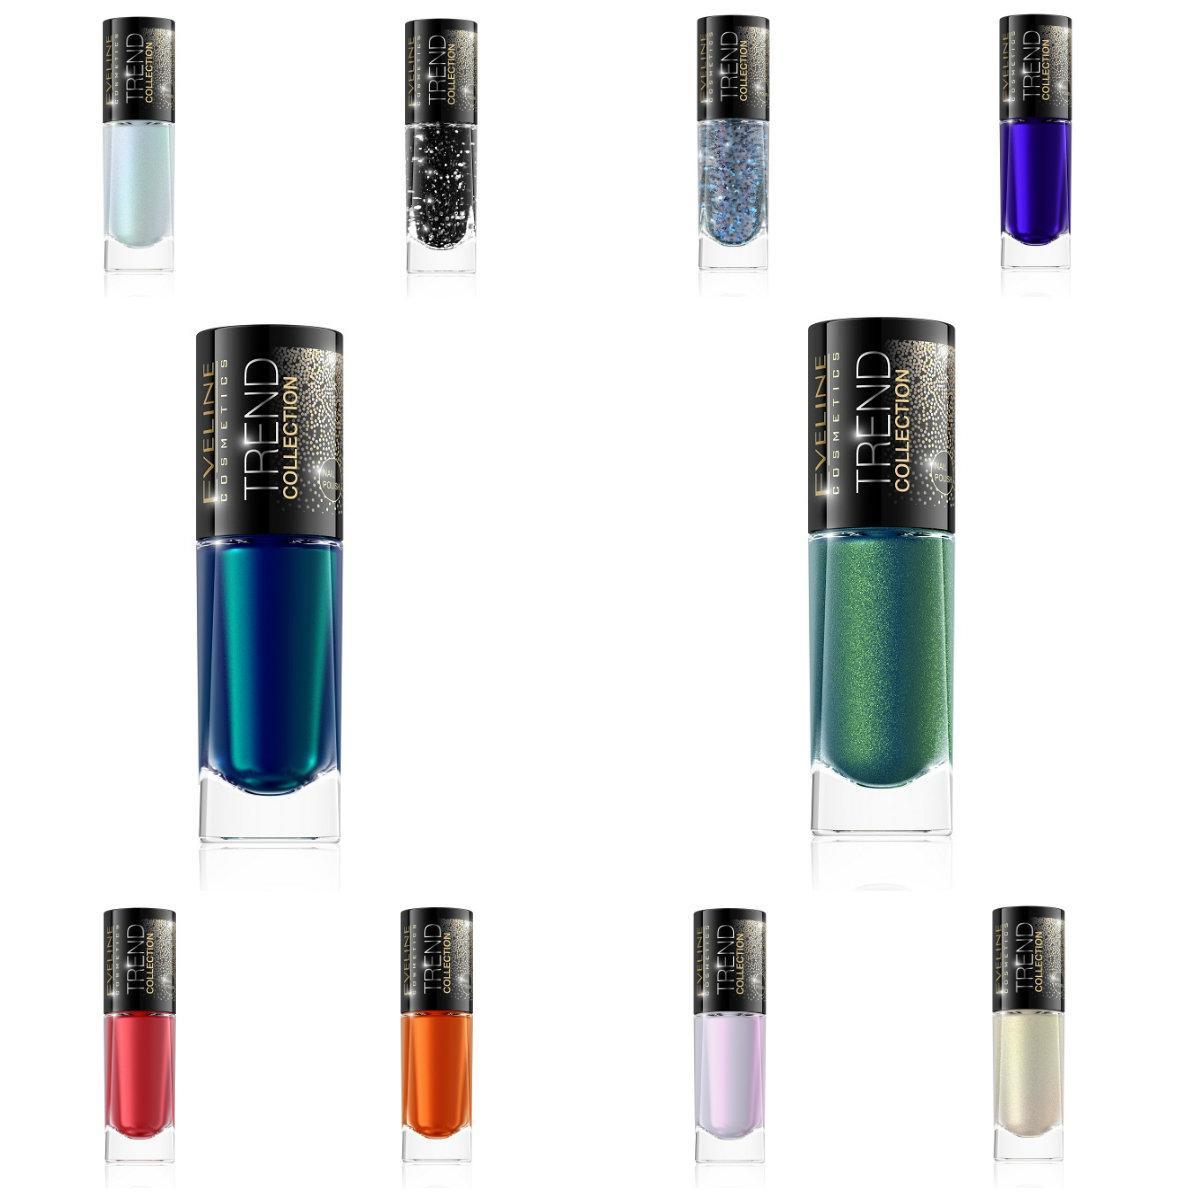 Eveline Cosmetics 8 мл TREND COLLECTION Лак для ногтей №279  продажа ... da604b1c879a2